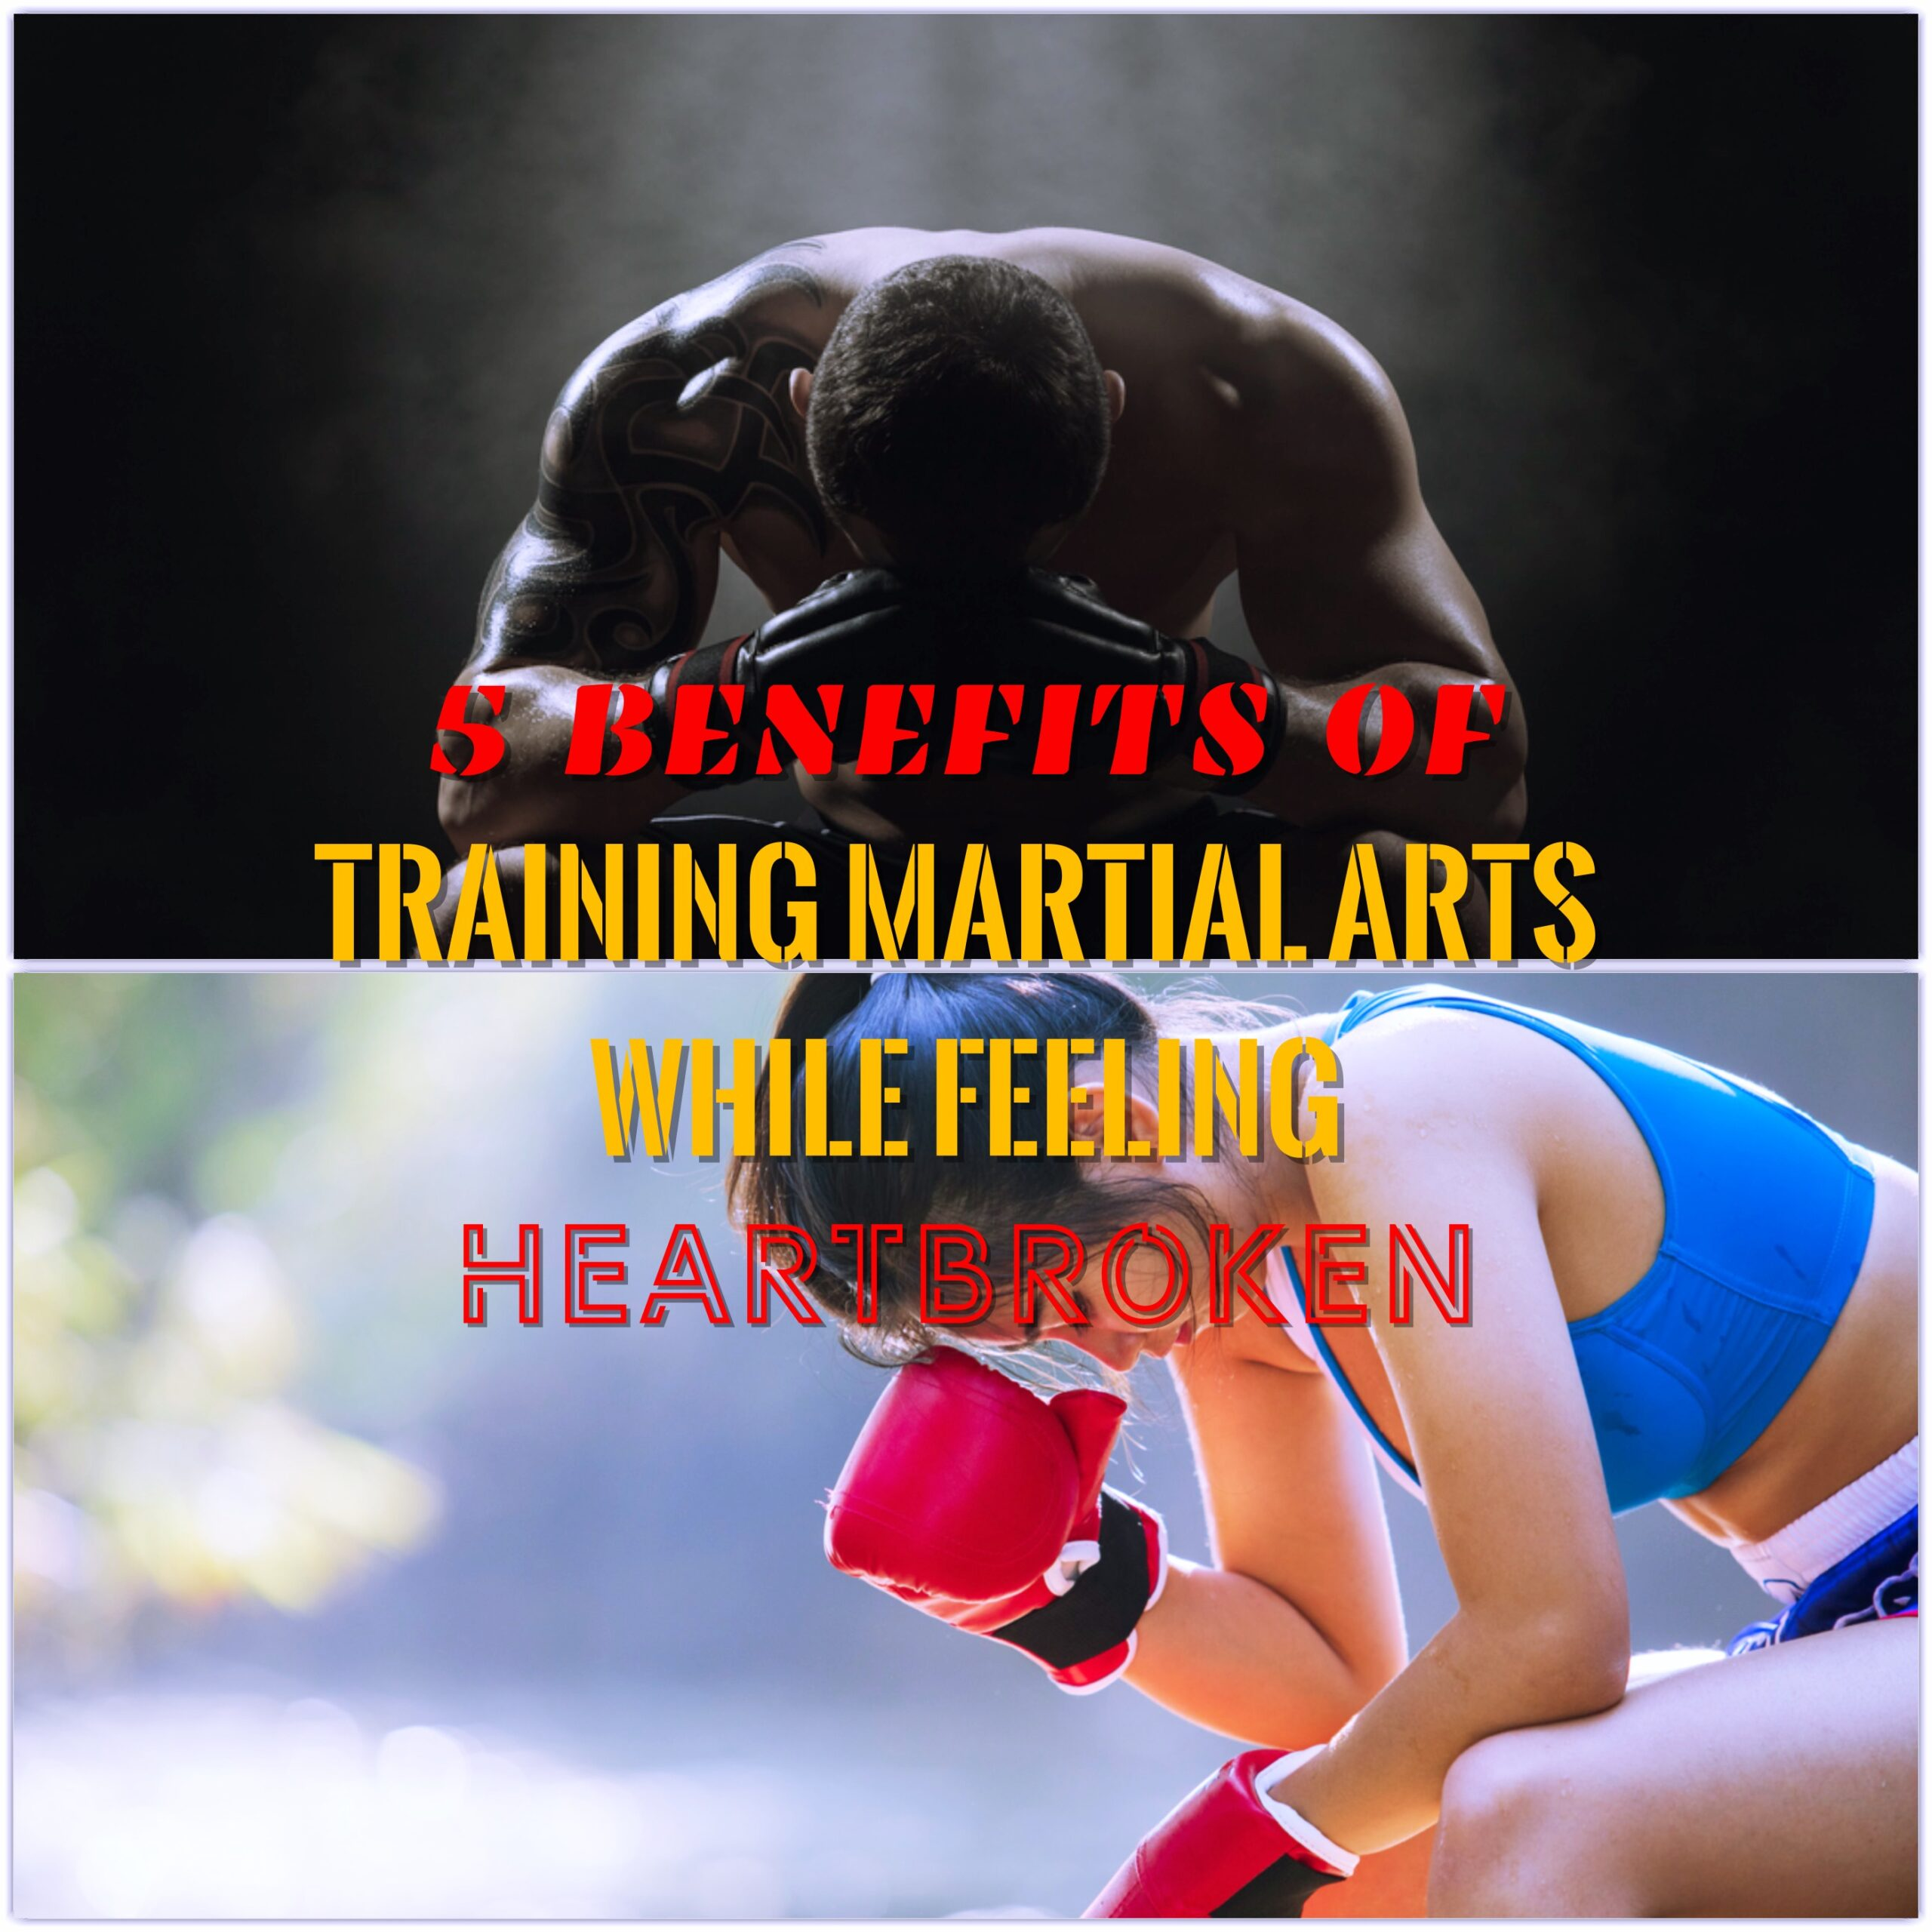 5 Benefits of Training Martial Arts While Feeling Heartbroken